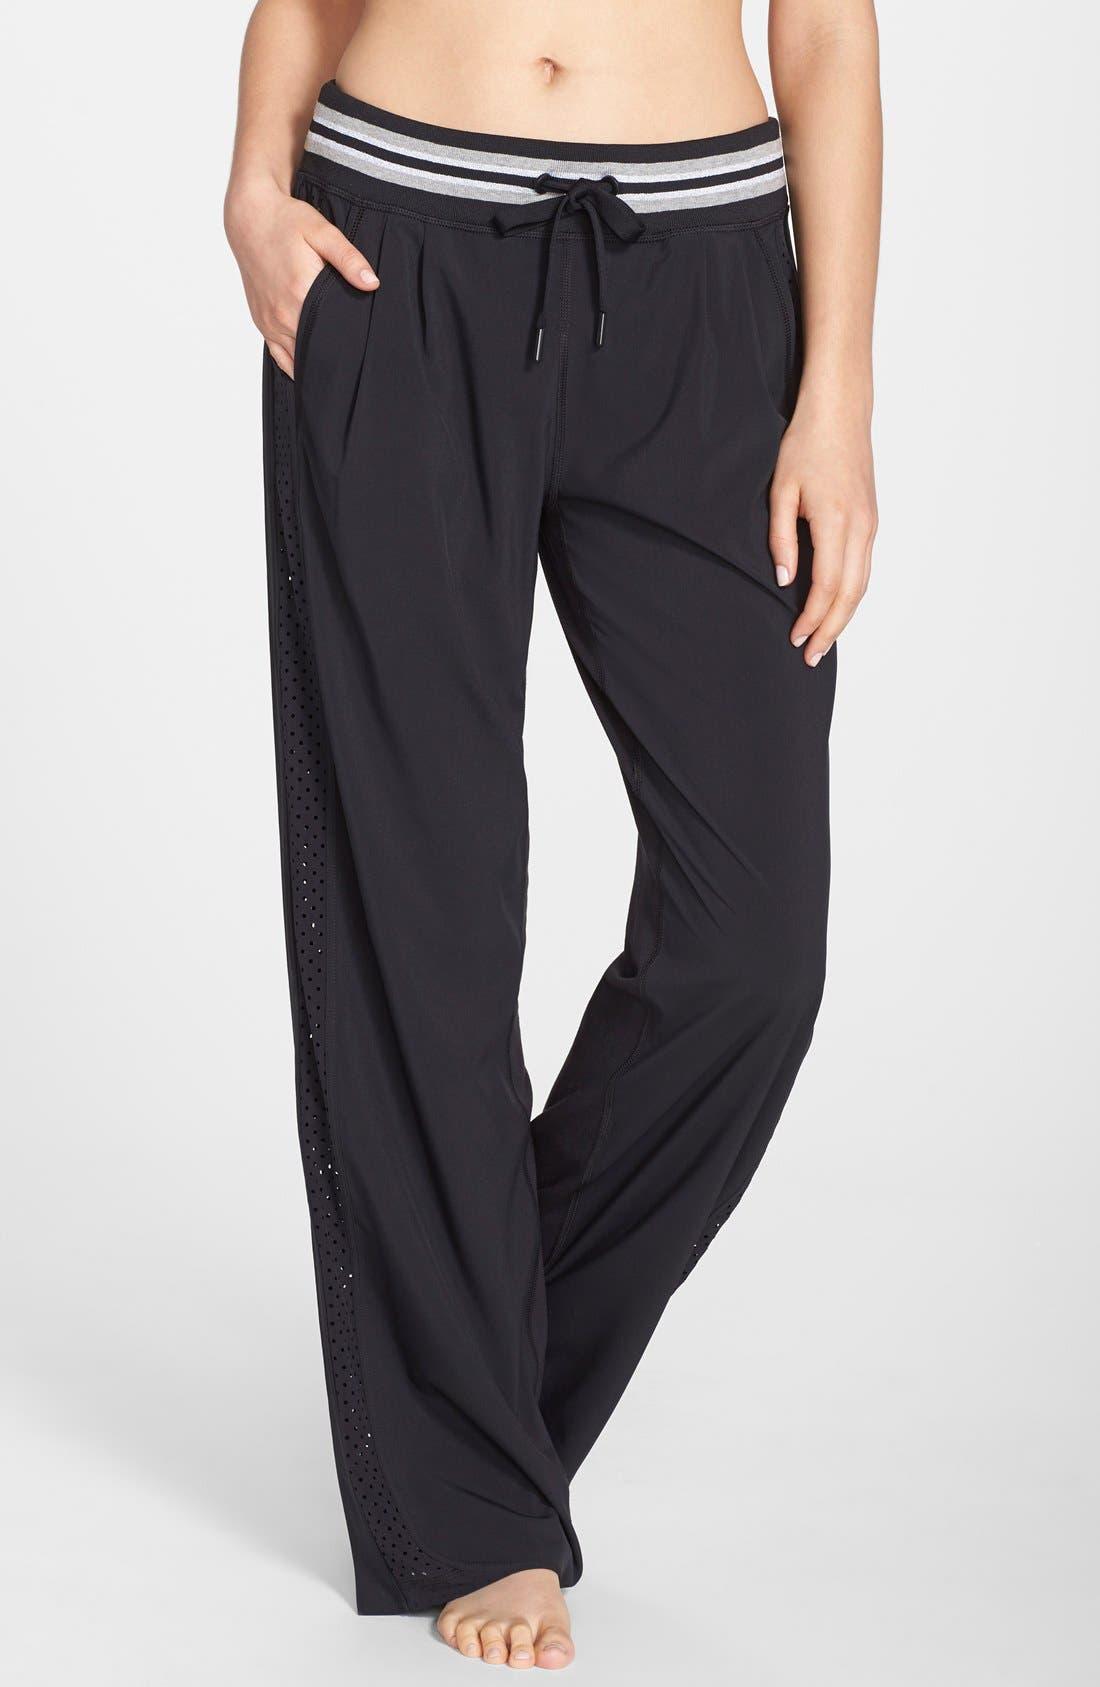 Alternate Image 1 Selected - Zella Side Zip Track Pants